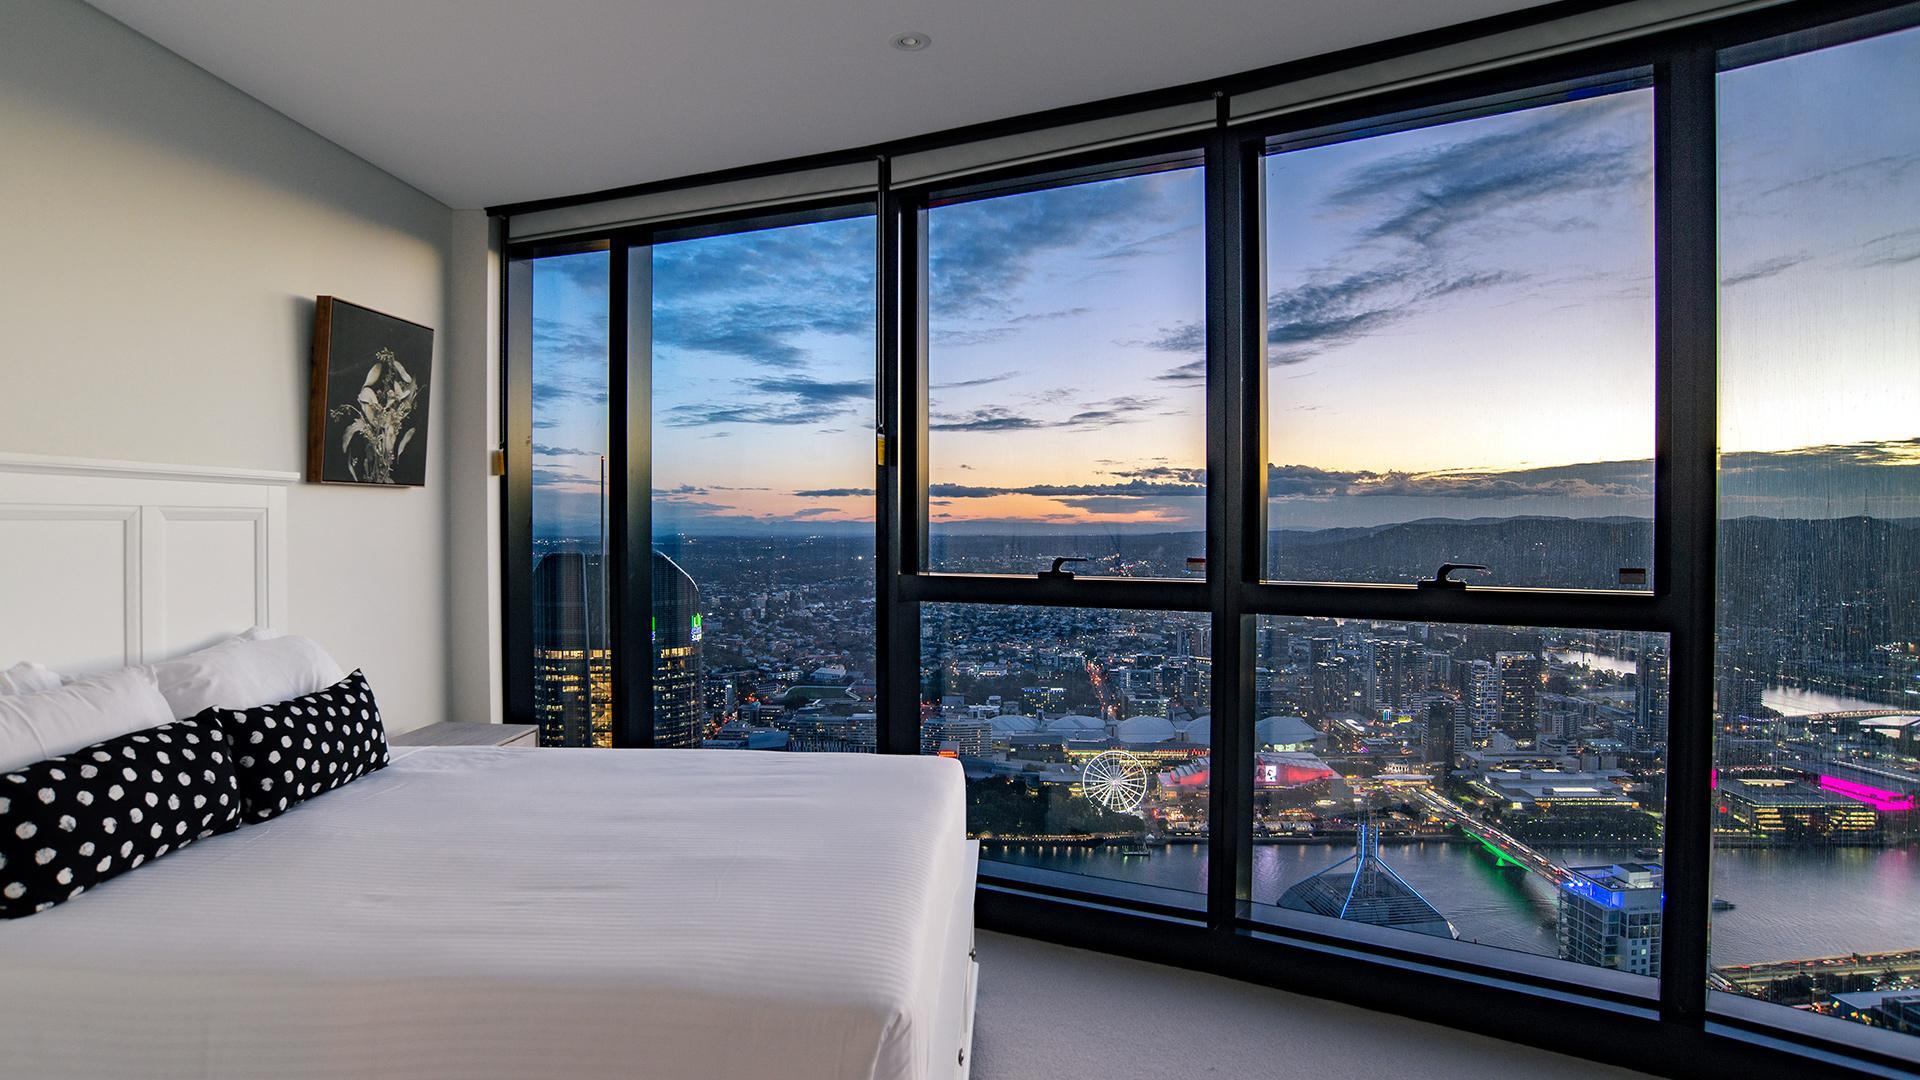 Three-Bedroom Sky High Apartment  image 1 at Arise Brisbane Skytower by Brisbane City, Queensland, Australia